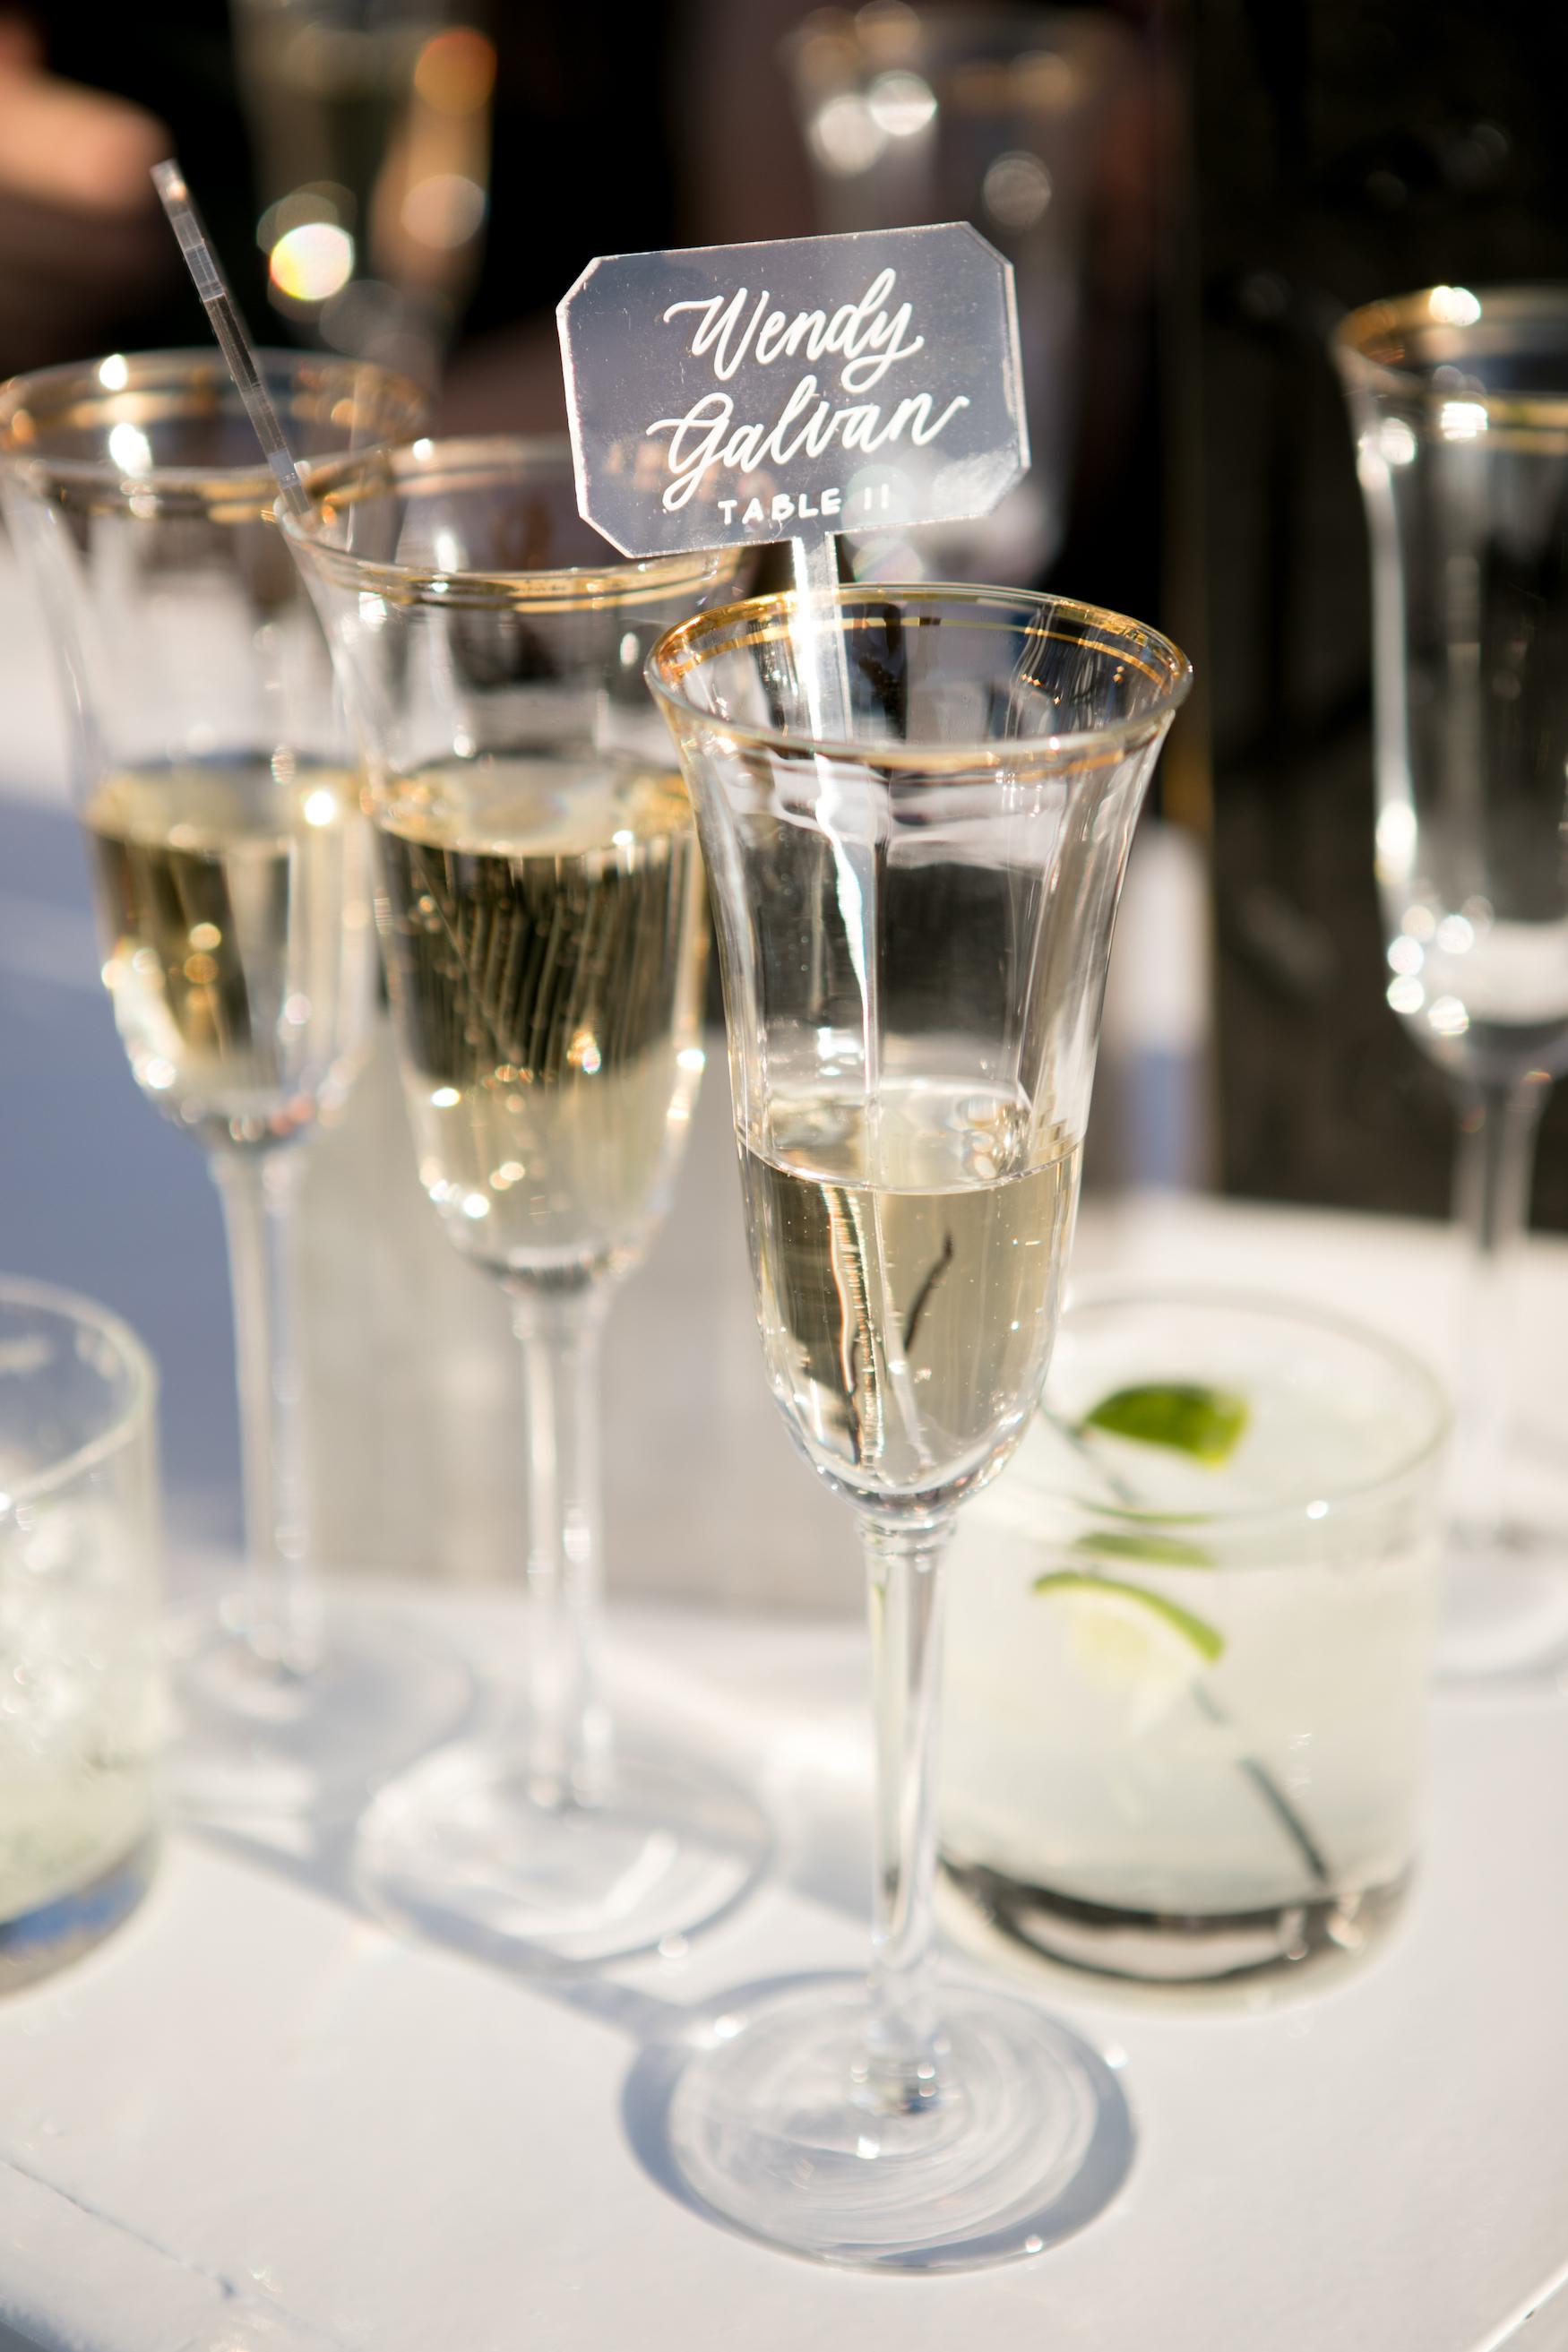 acrylic drink stirrer escort cards.jpg